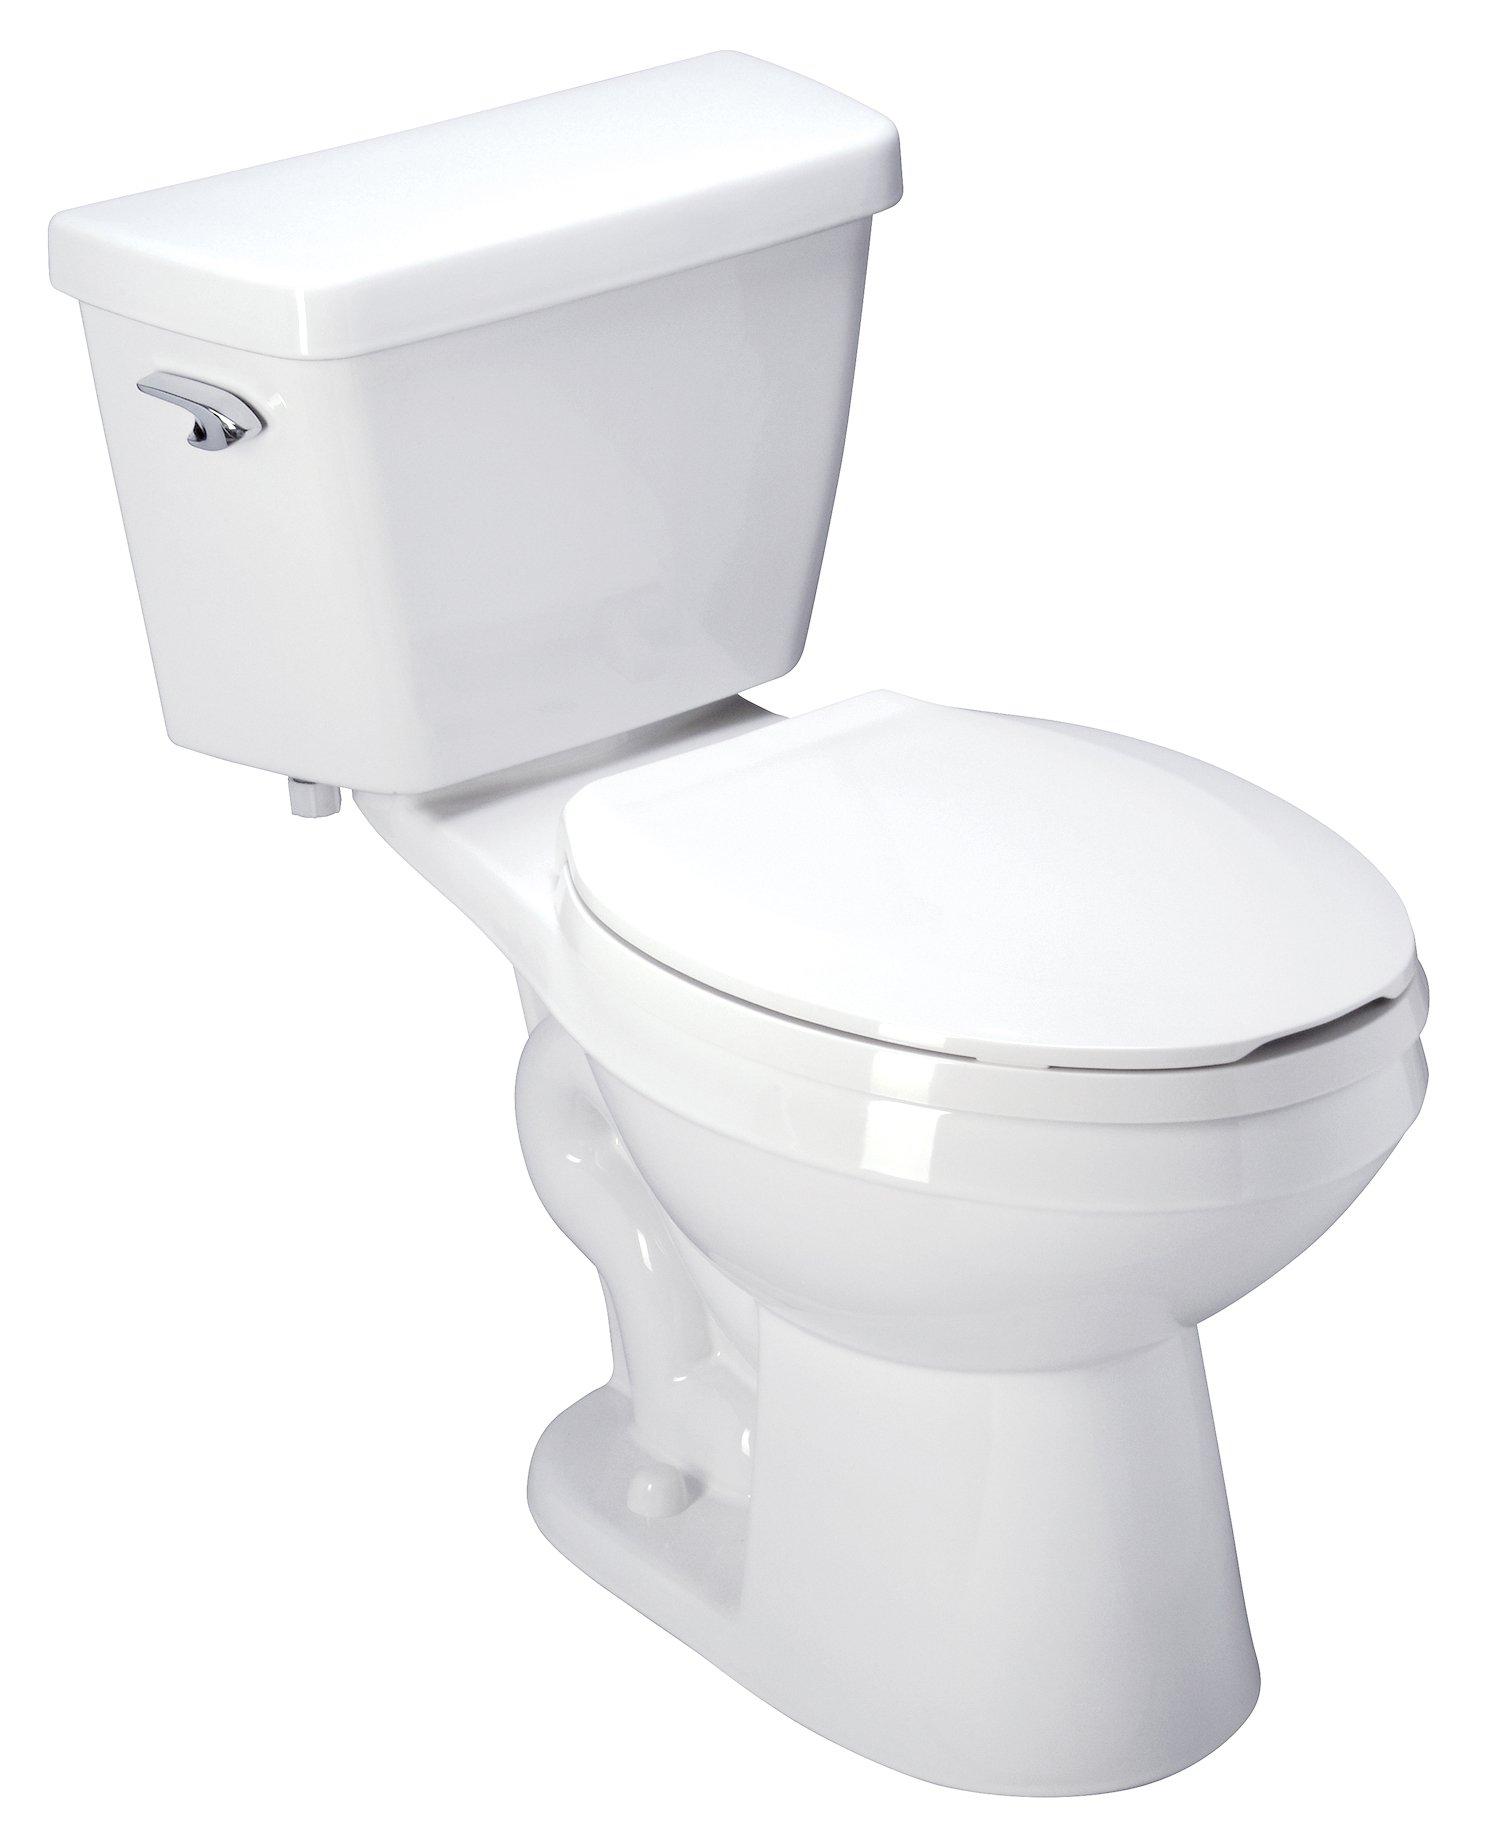 Zurn Z5551 ADA, Elongated, 3'' HPT Performance, Siphon Jet, 1.6 gpf Two-Piece Toilet